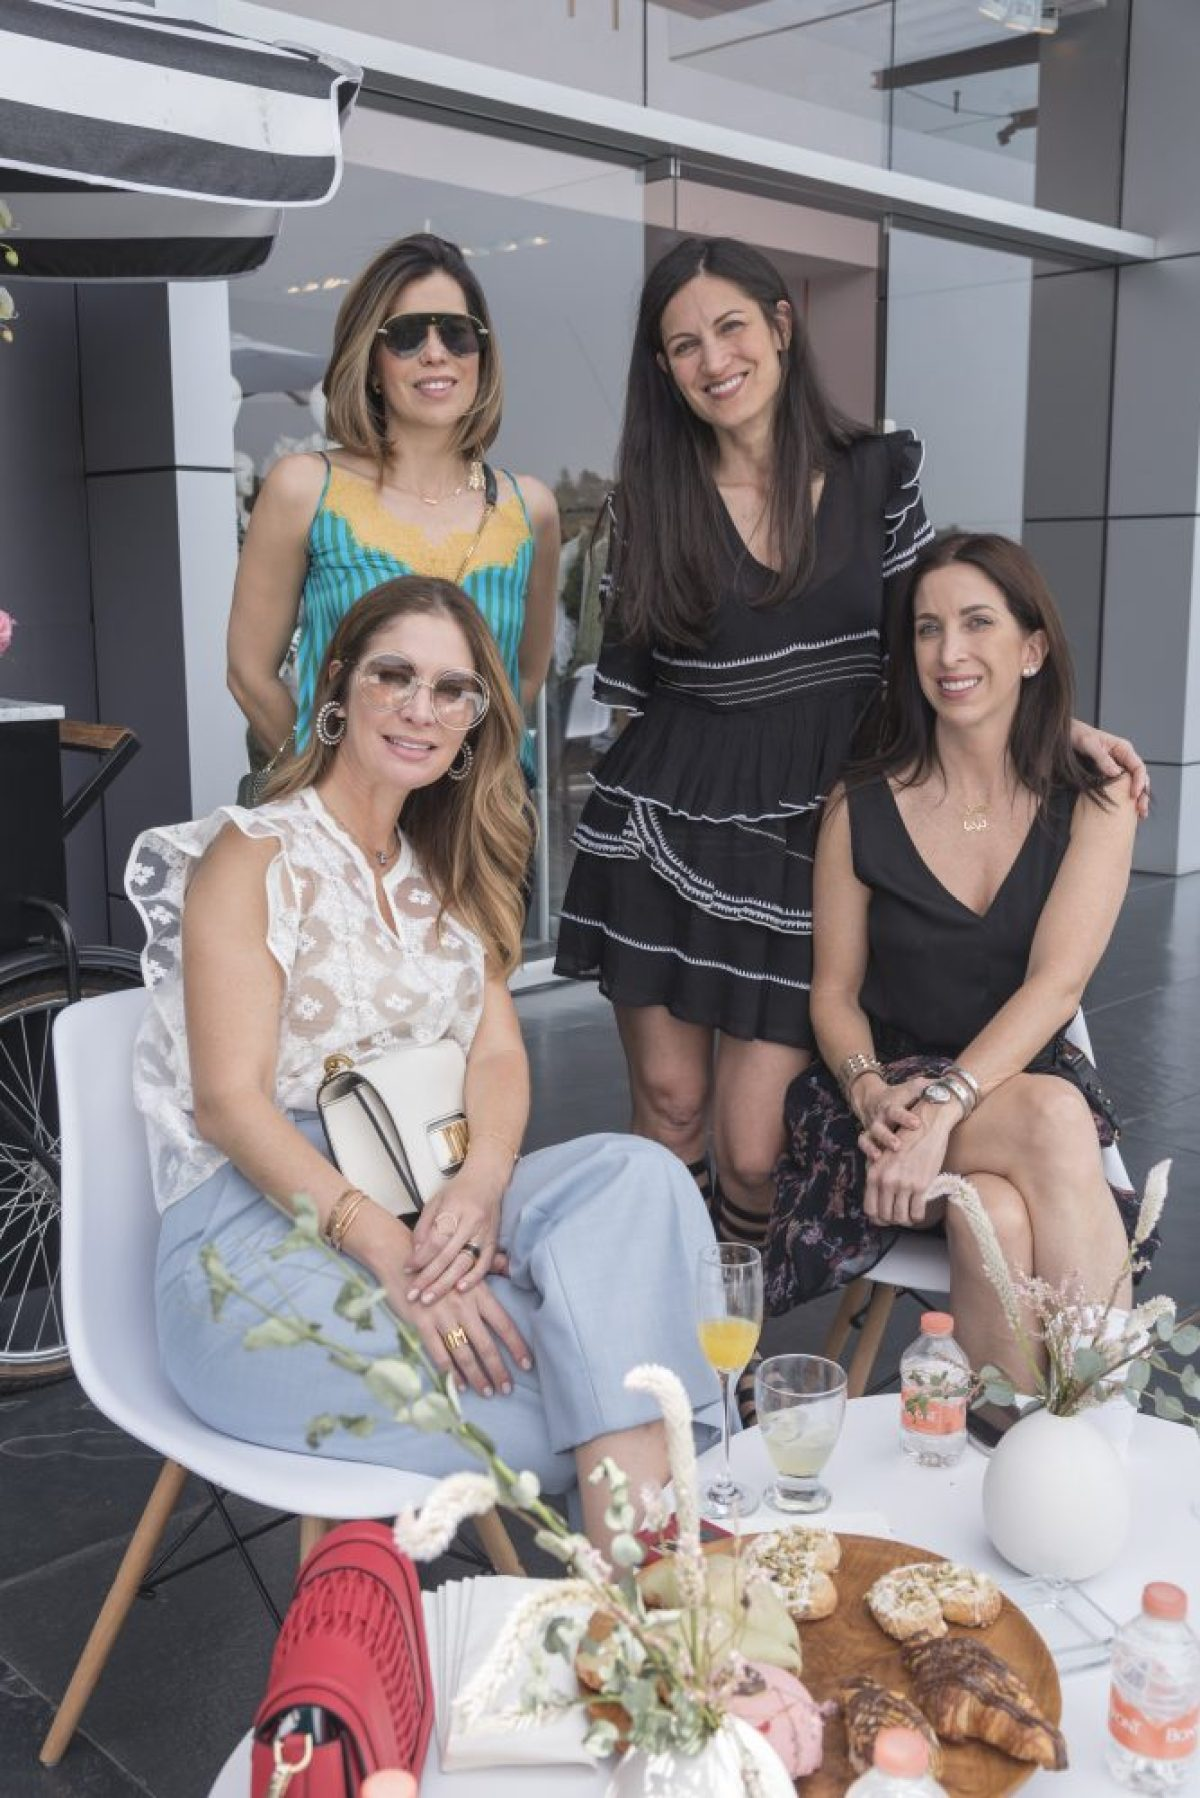 Valentina Uzcategui, Marlene de la garza, Yliana Yepes y Lídia Elizondo